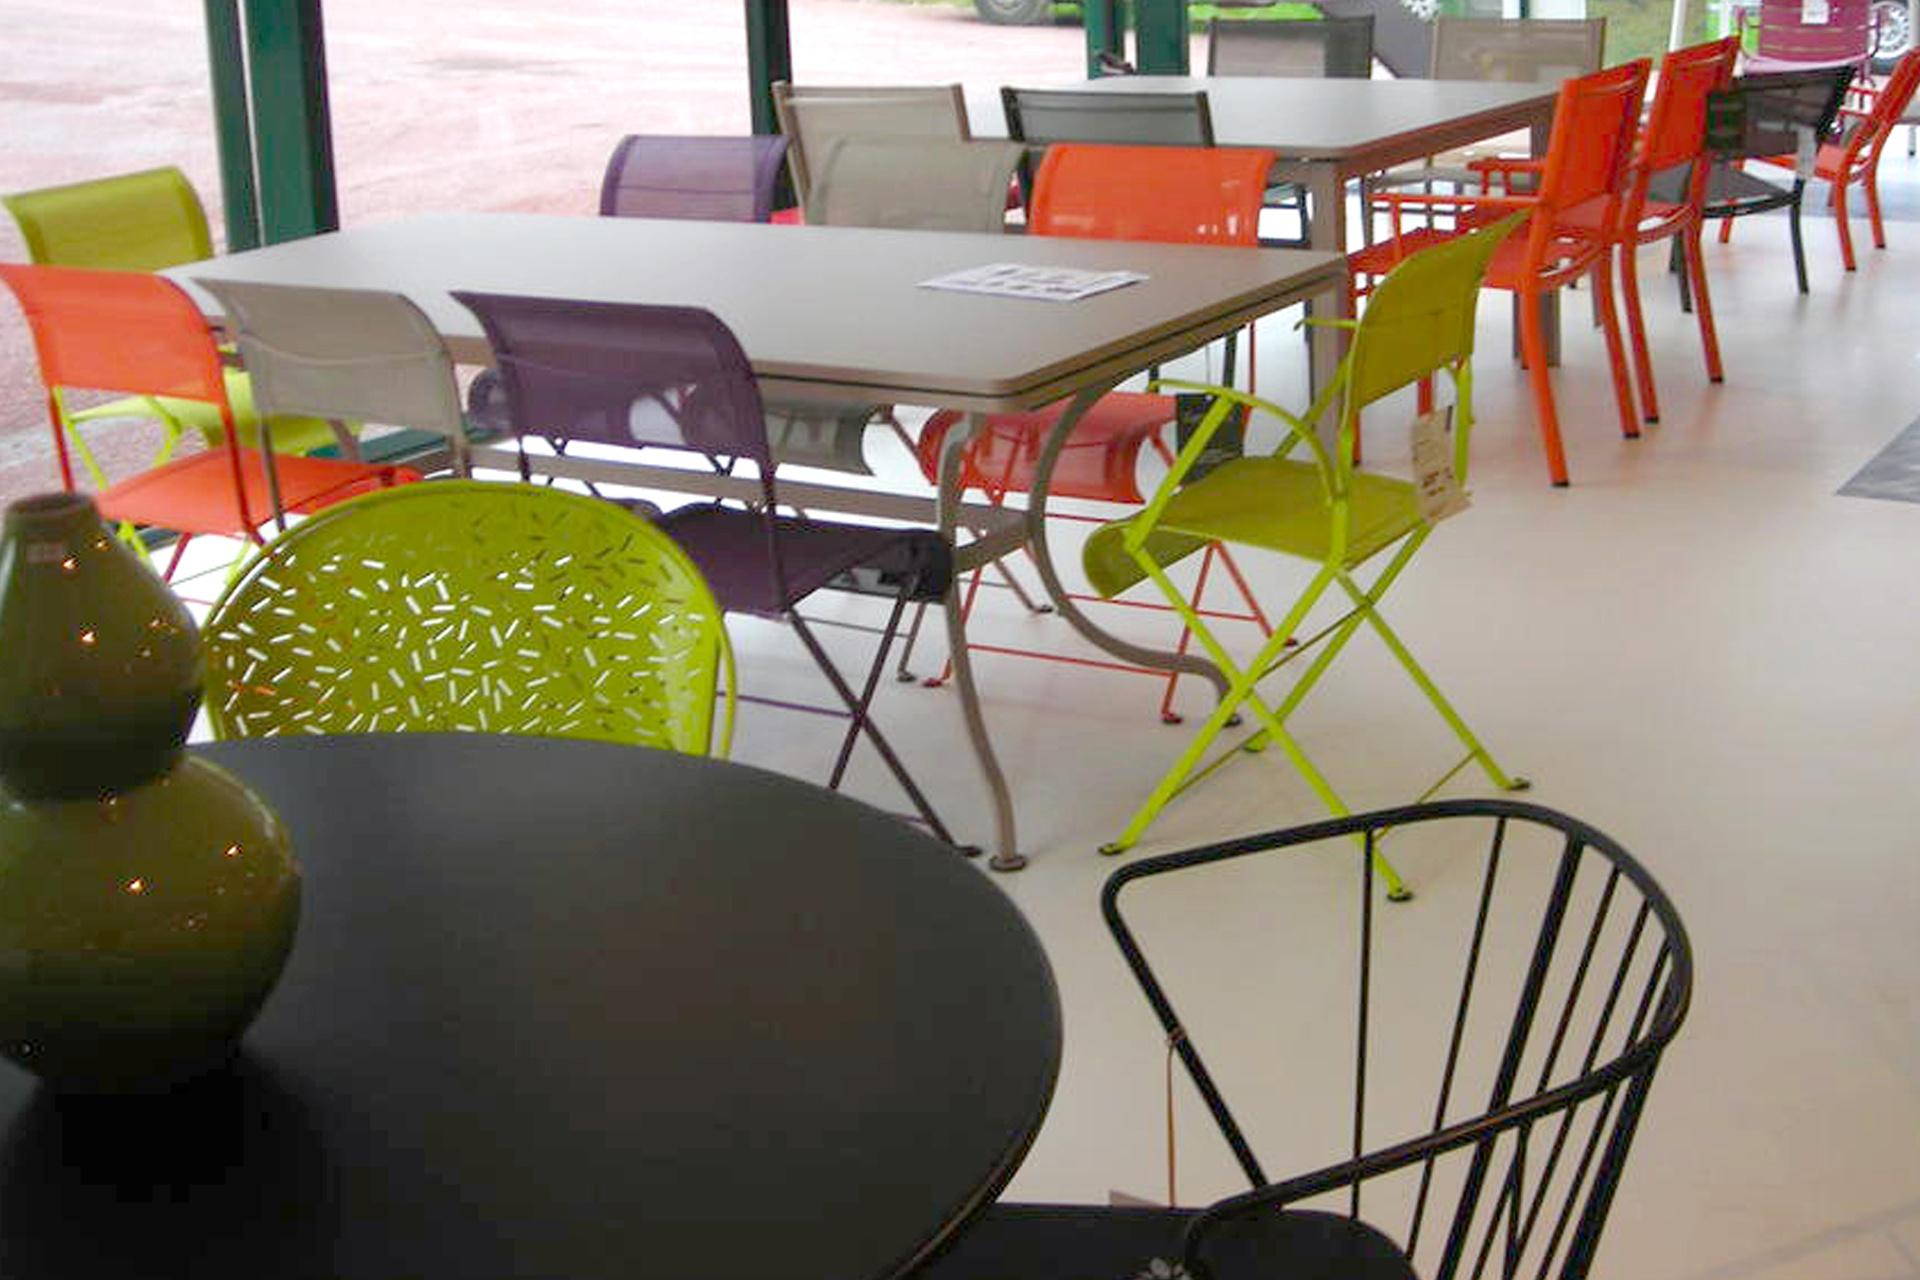 Salon de jardin en metal de couleur - Mc immo